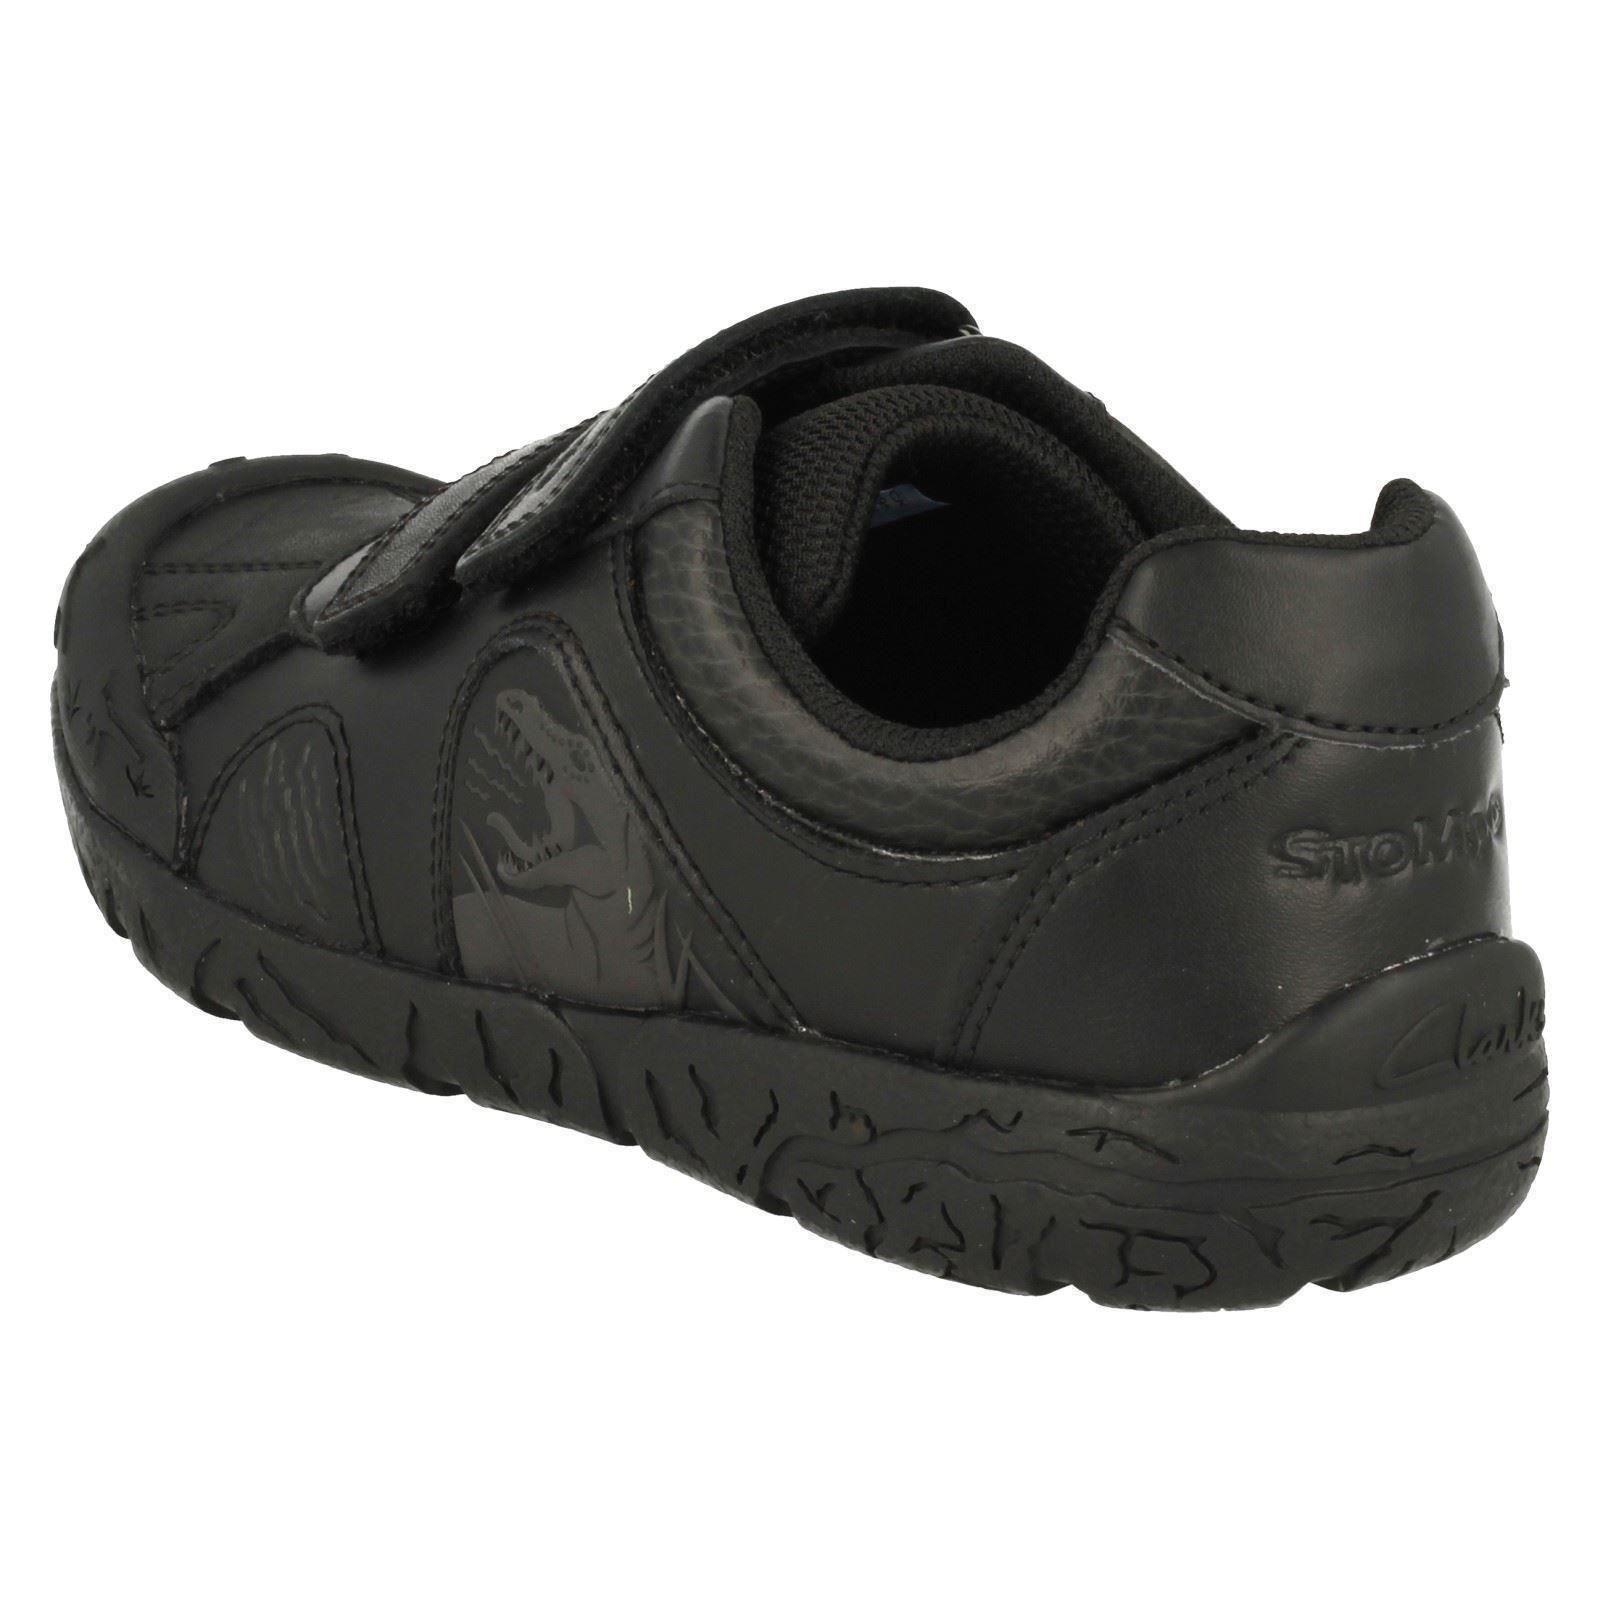 Boys Clarks Bronto Step Dinosaur School Shoes